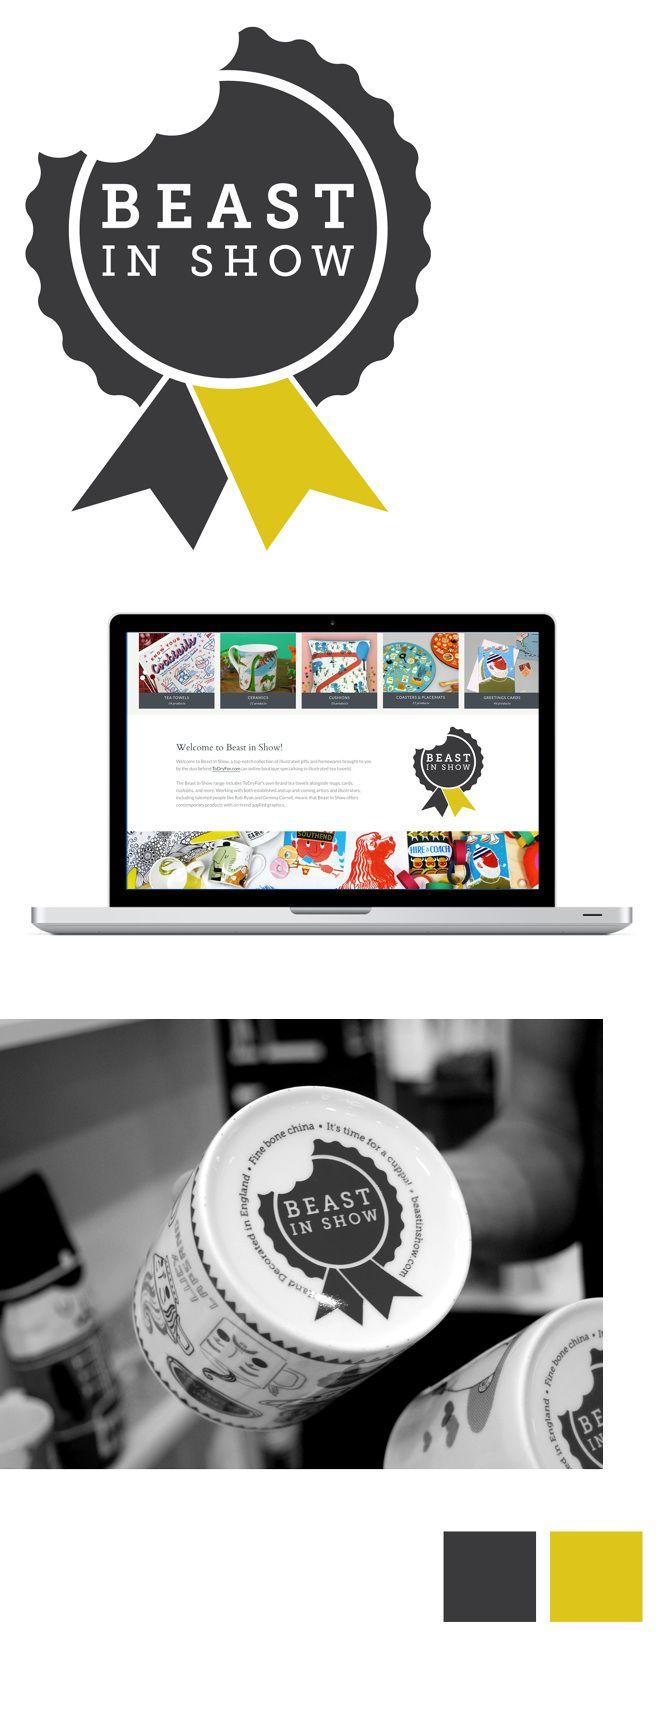 Branding: Beast in Show - HelloWilson | Graphic Designer Edinburgh | Branding design for small business | Edinburgh & UK  Click to find out more  #edinburghgraphicdesigner #edinburghdesigner #graphicdesigner #smallbusinessdesign #femaleentrepreneur #smallbusiness #creativebusiness #edinburghcreative #branding #identity #design #brandingdesign